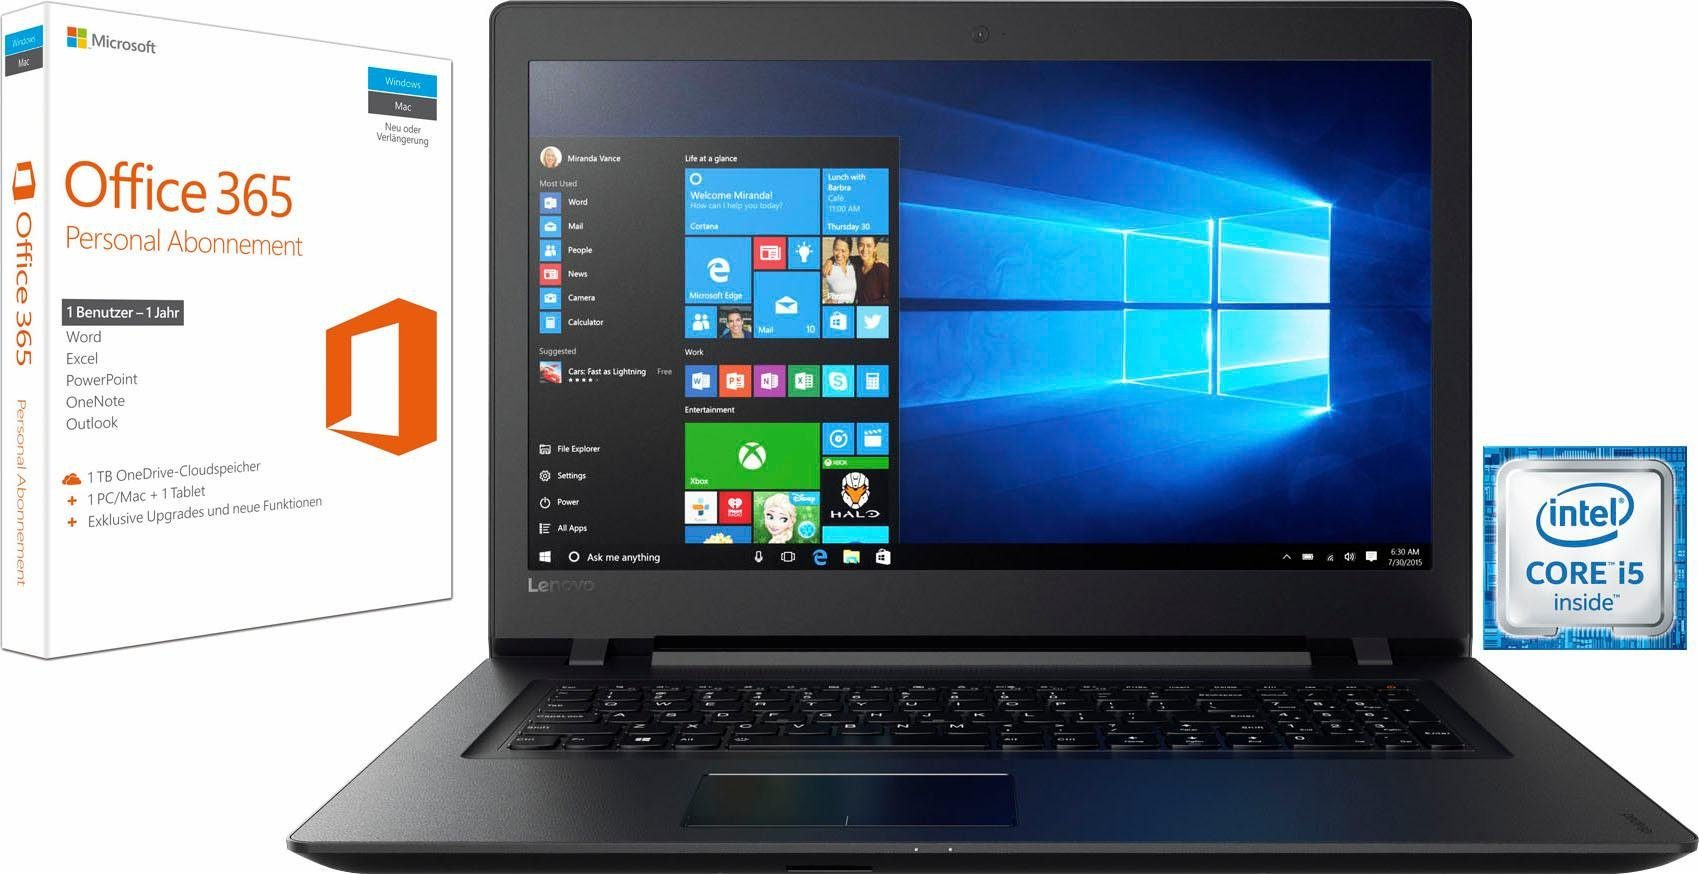 Lenovo Ideapad 110-17IKB Notebook (43,9 cm/17,3 Zoll, Intel Core i5, R5 M430, 2000 GB HDD)